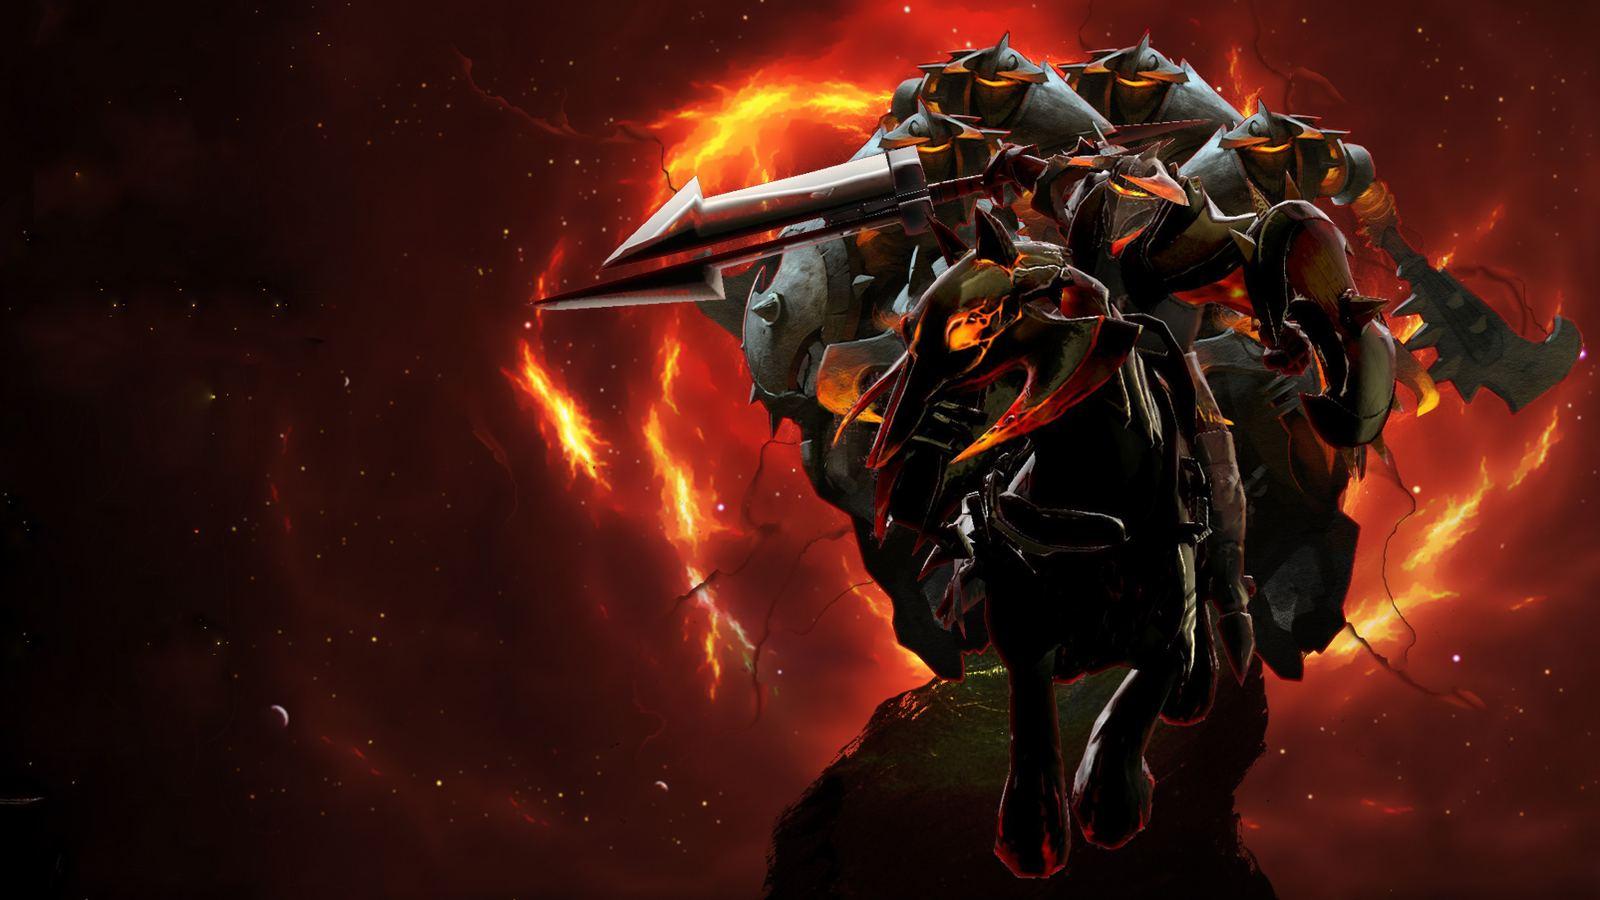 Dota2 : Chaos Knight widescreen wallpapers